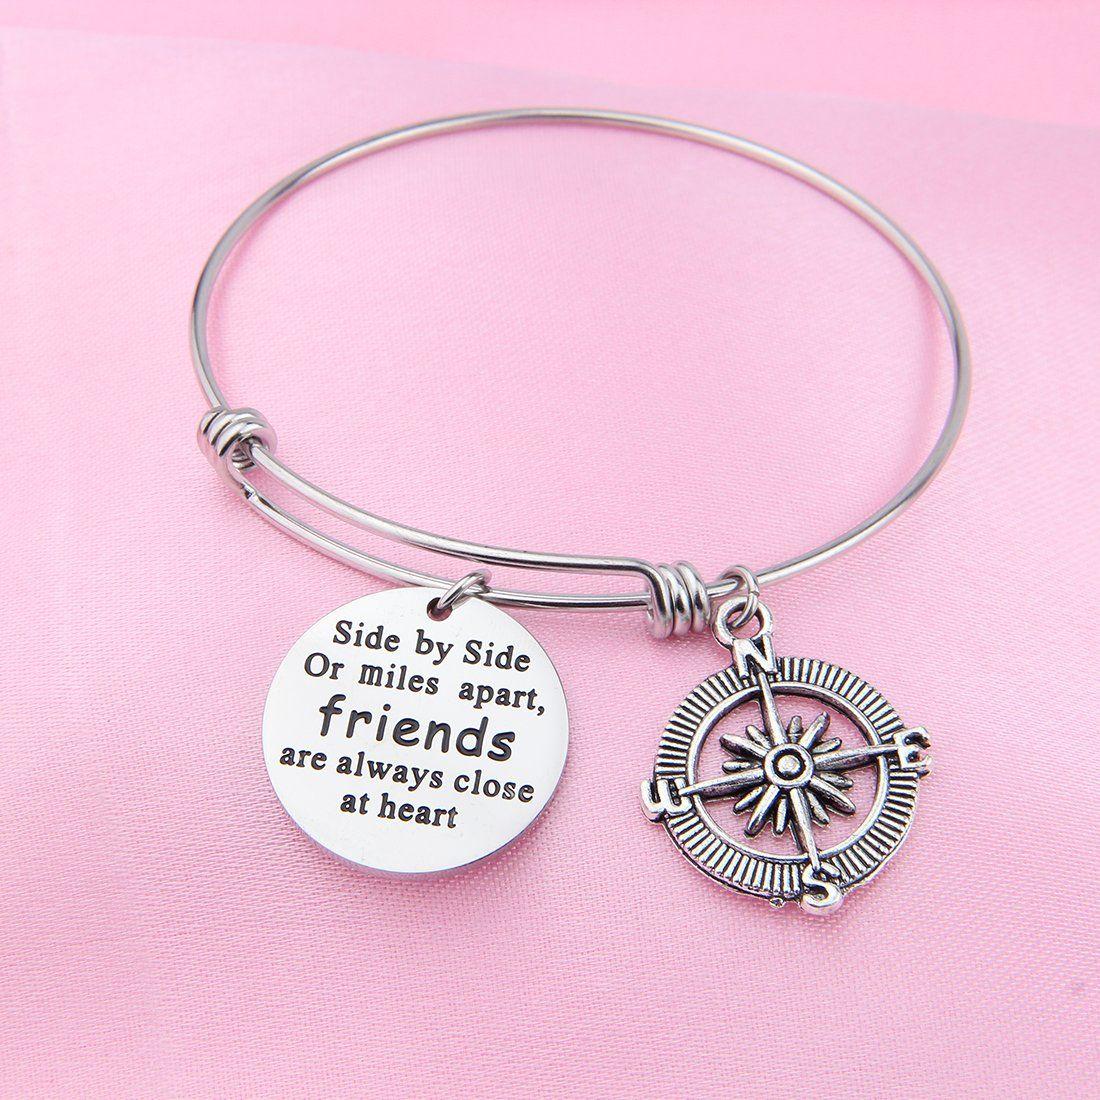 Best friend bracelets side by side or miles apart compass